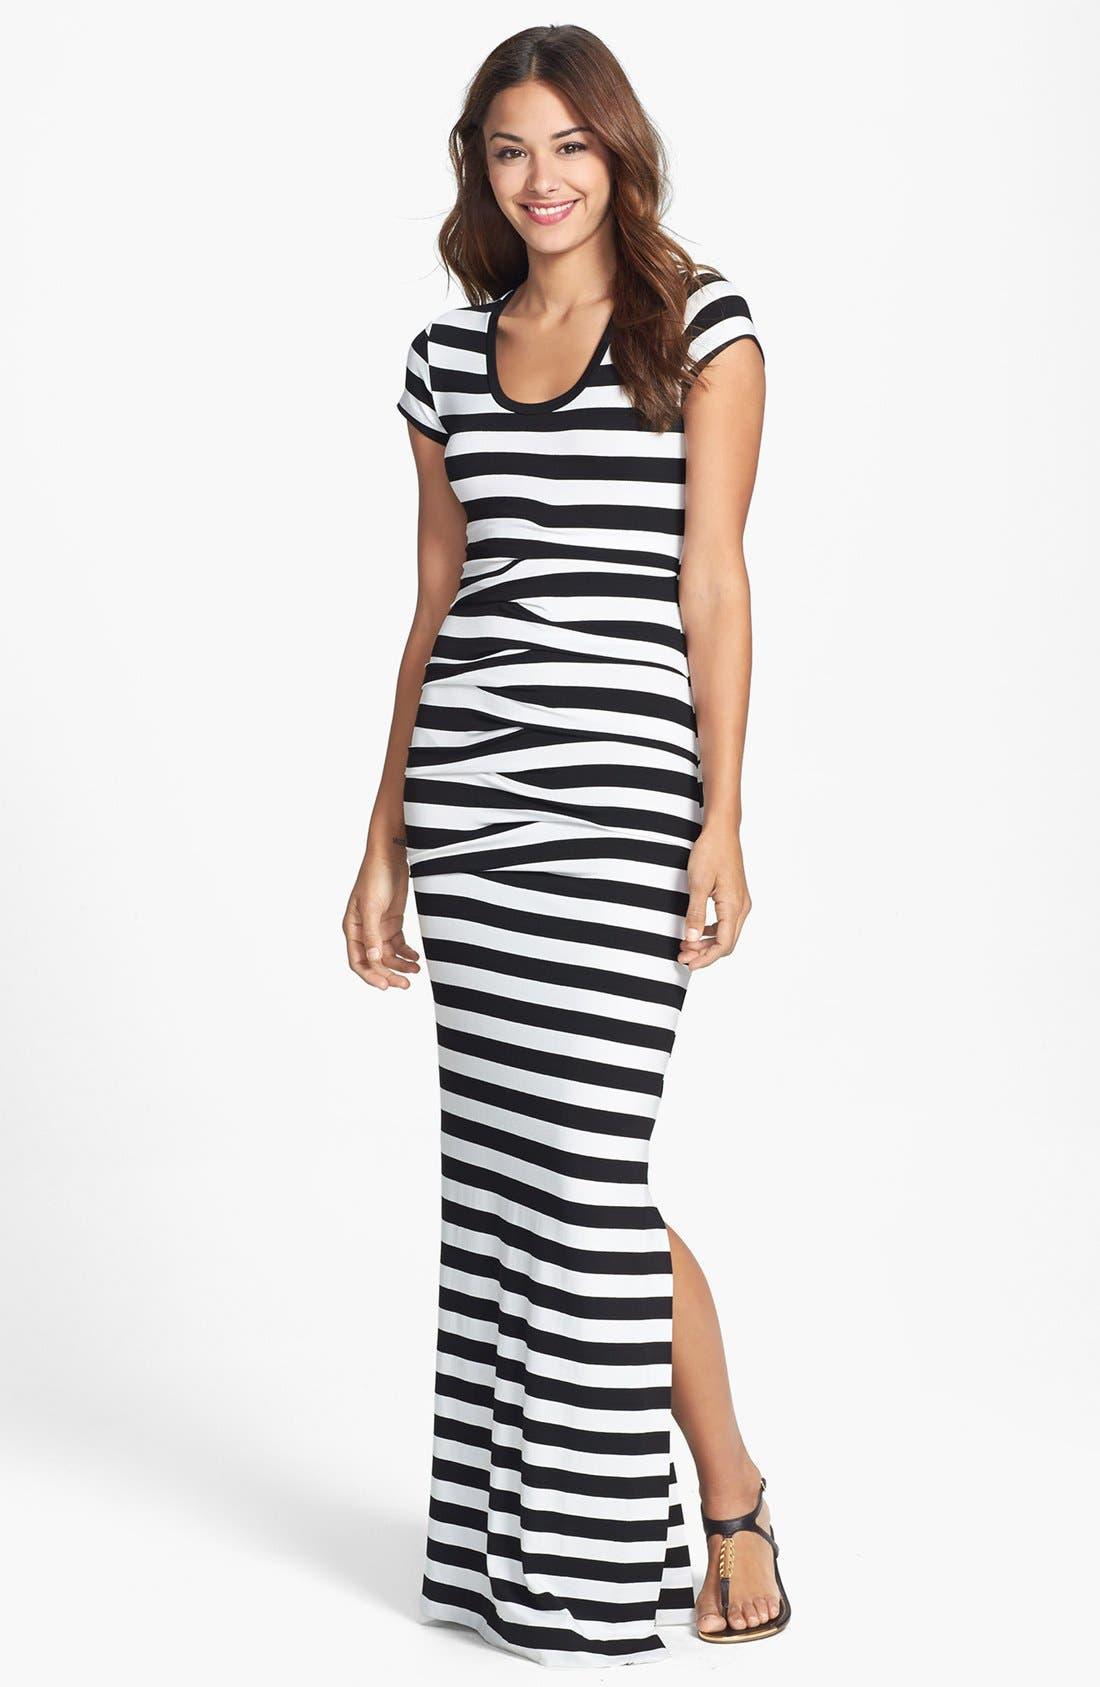 Alternate Image 1 Selected - Nicole Miller 'Vanessa' Stripe Tidal Pleat Jersey Maxi Dress